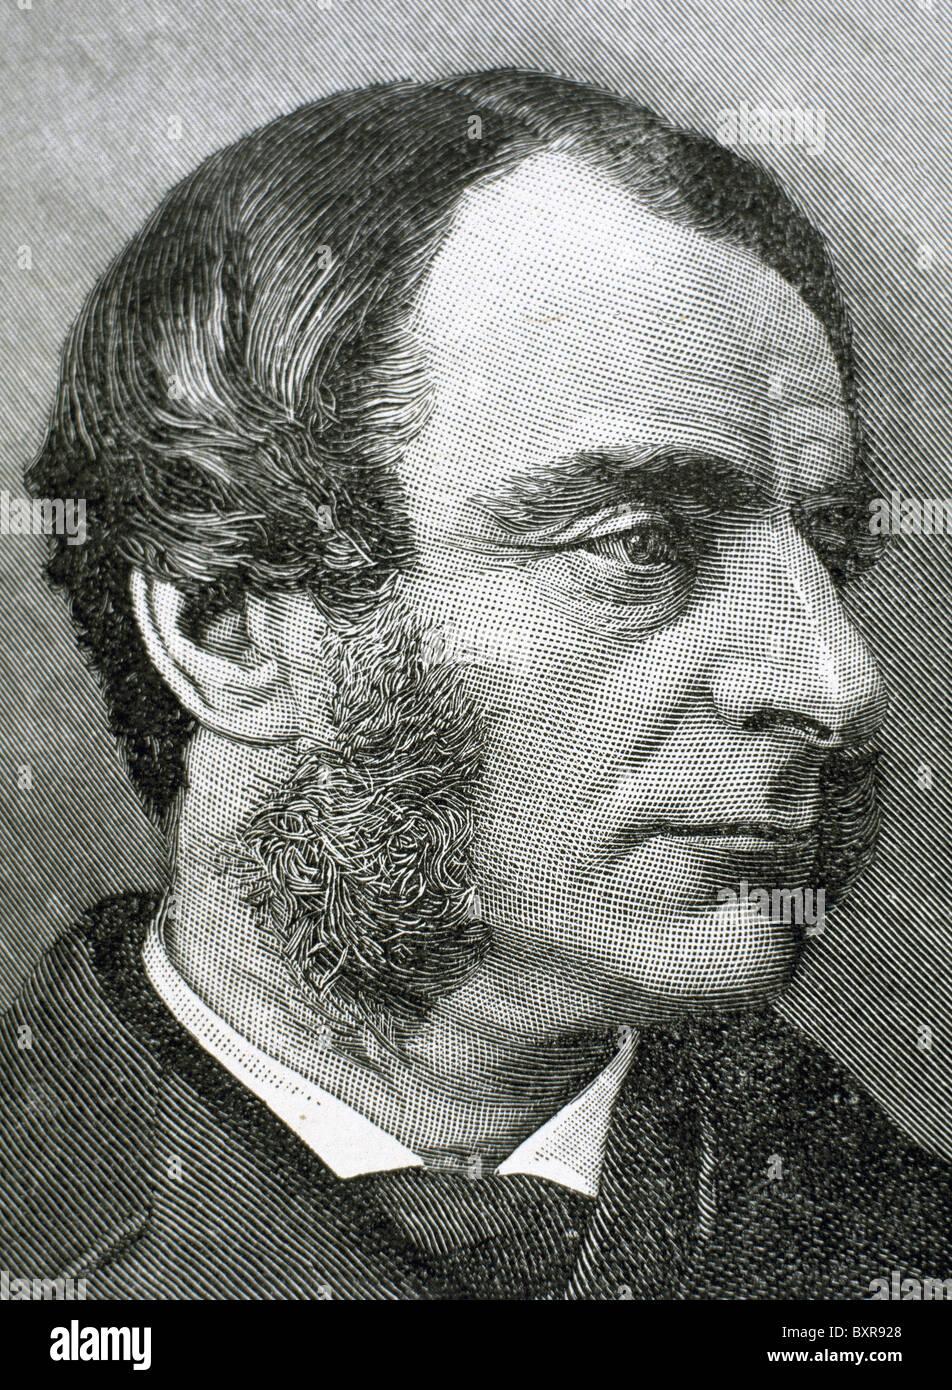 Kingsley, Charles (1819-1875). British writer and historian. Engraving. - Stock Image